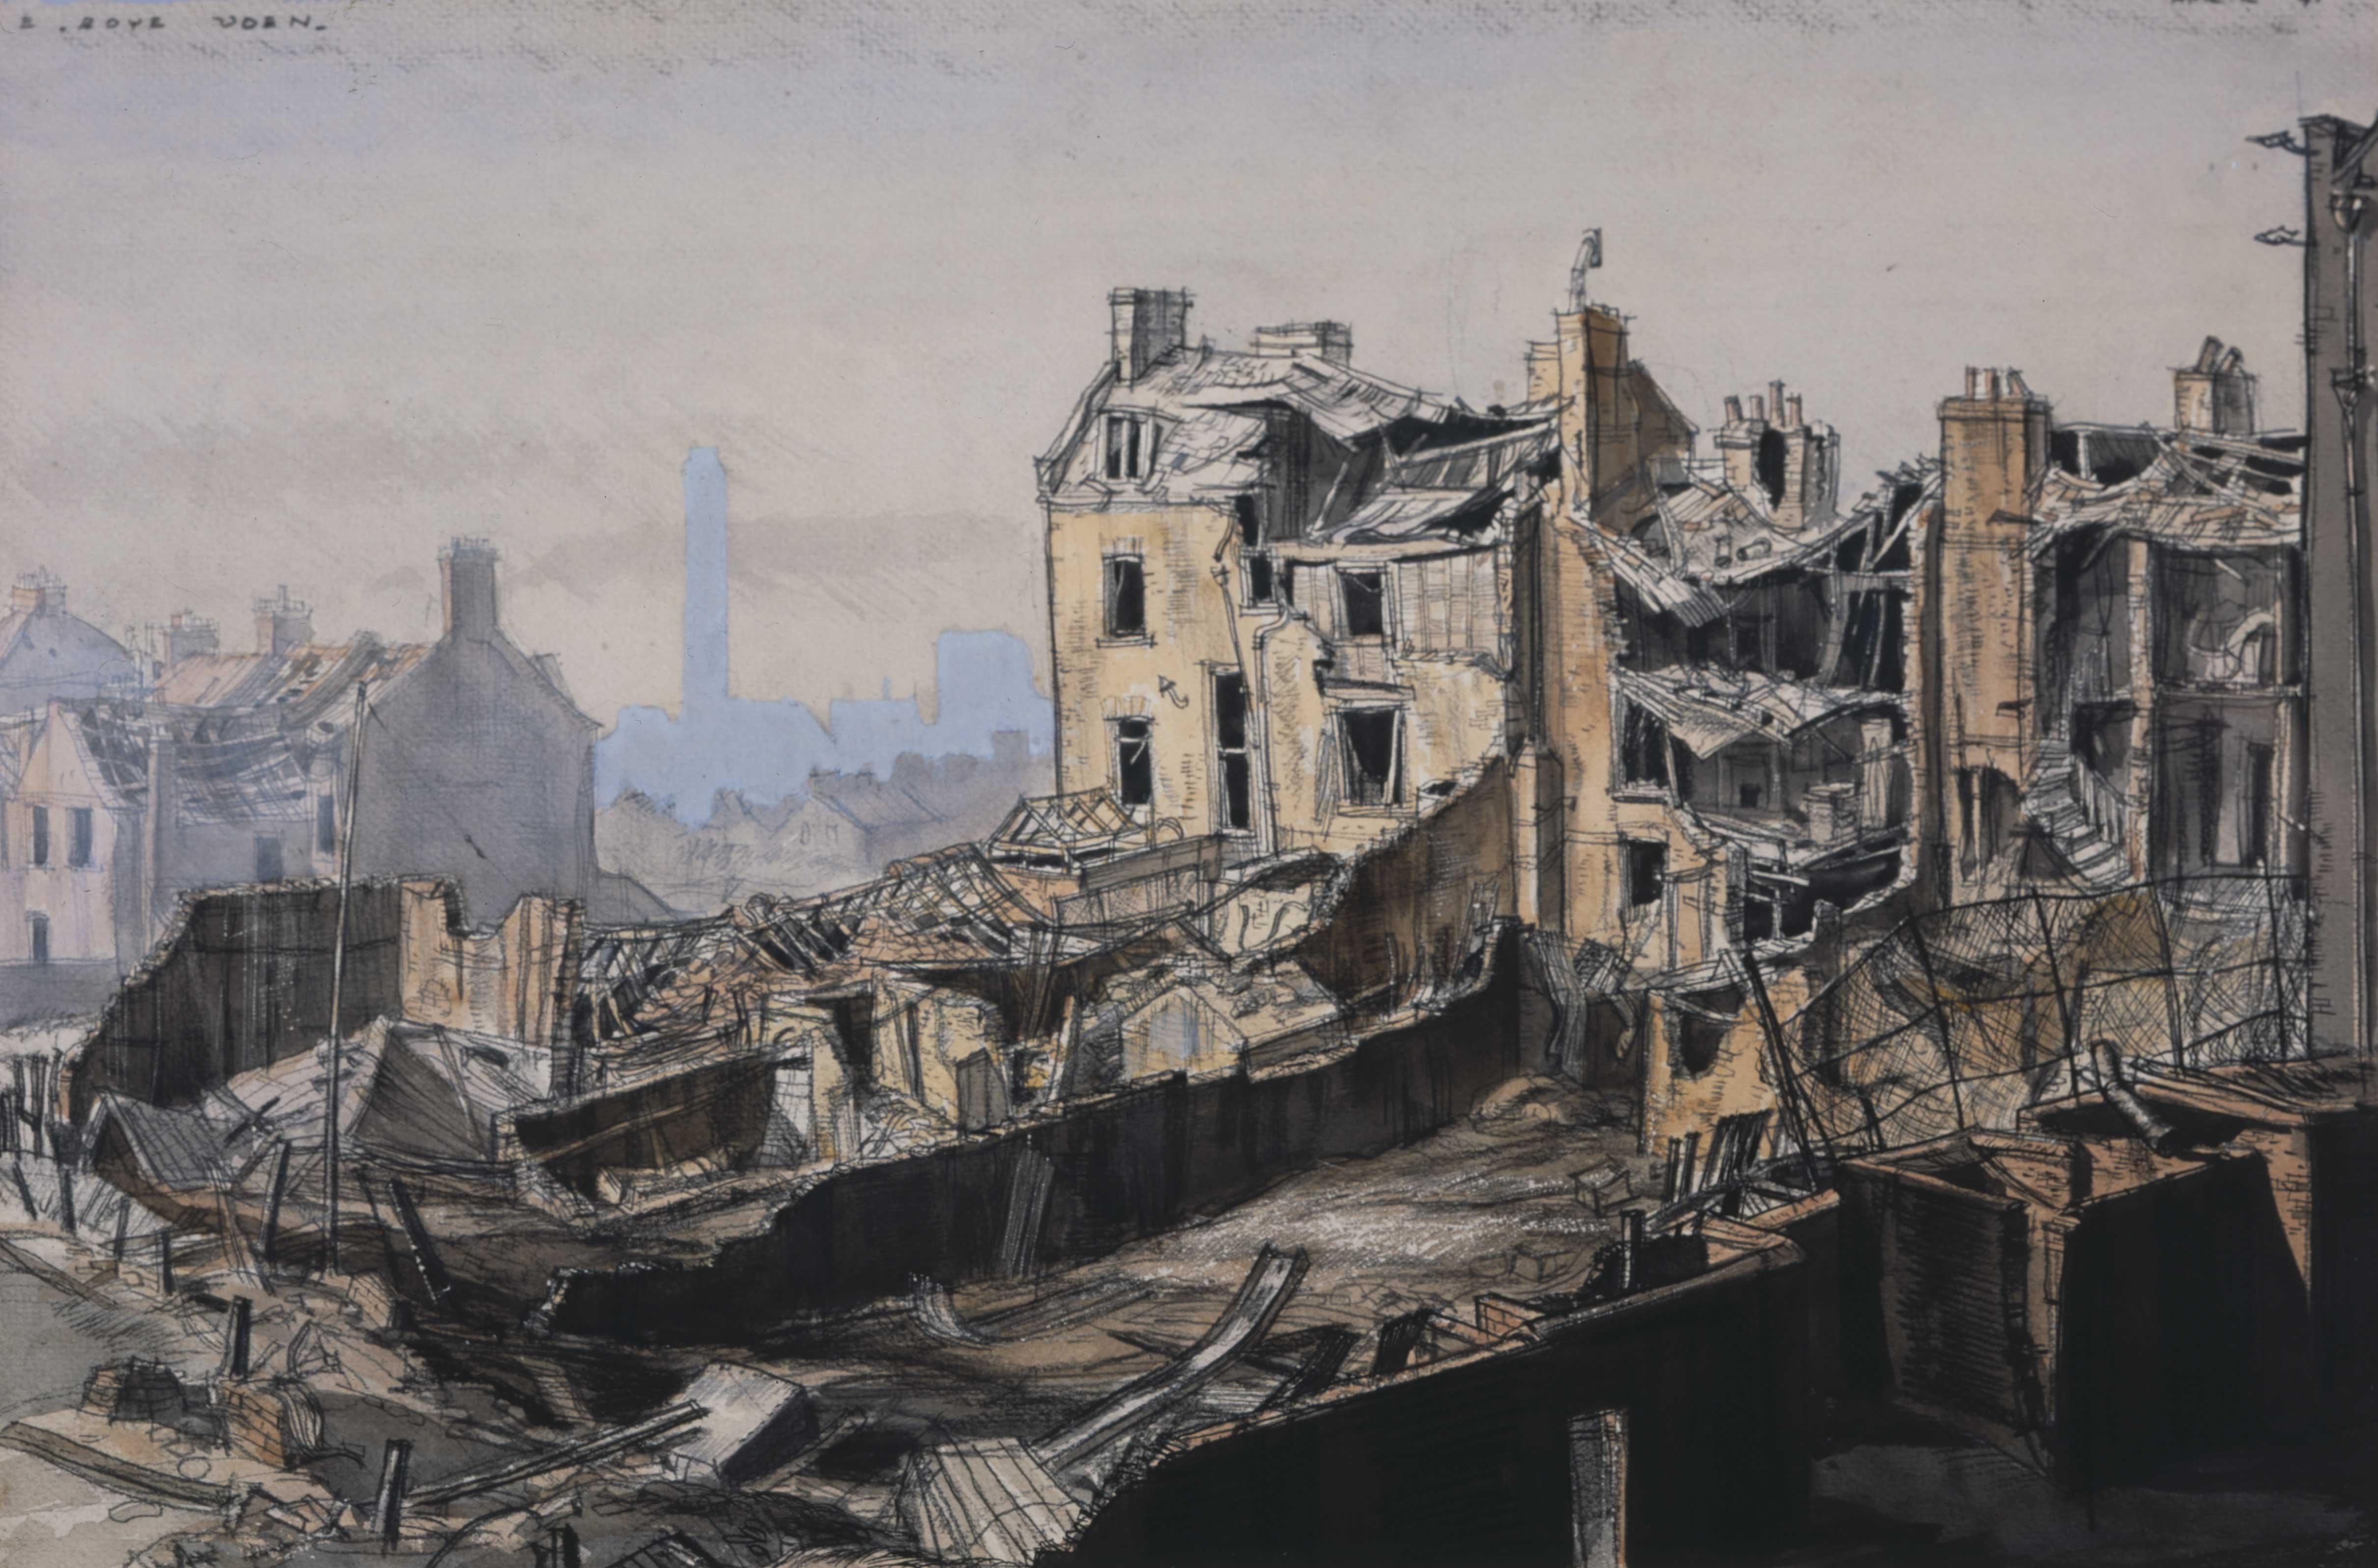 Land Mine-Blast, S.E. London